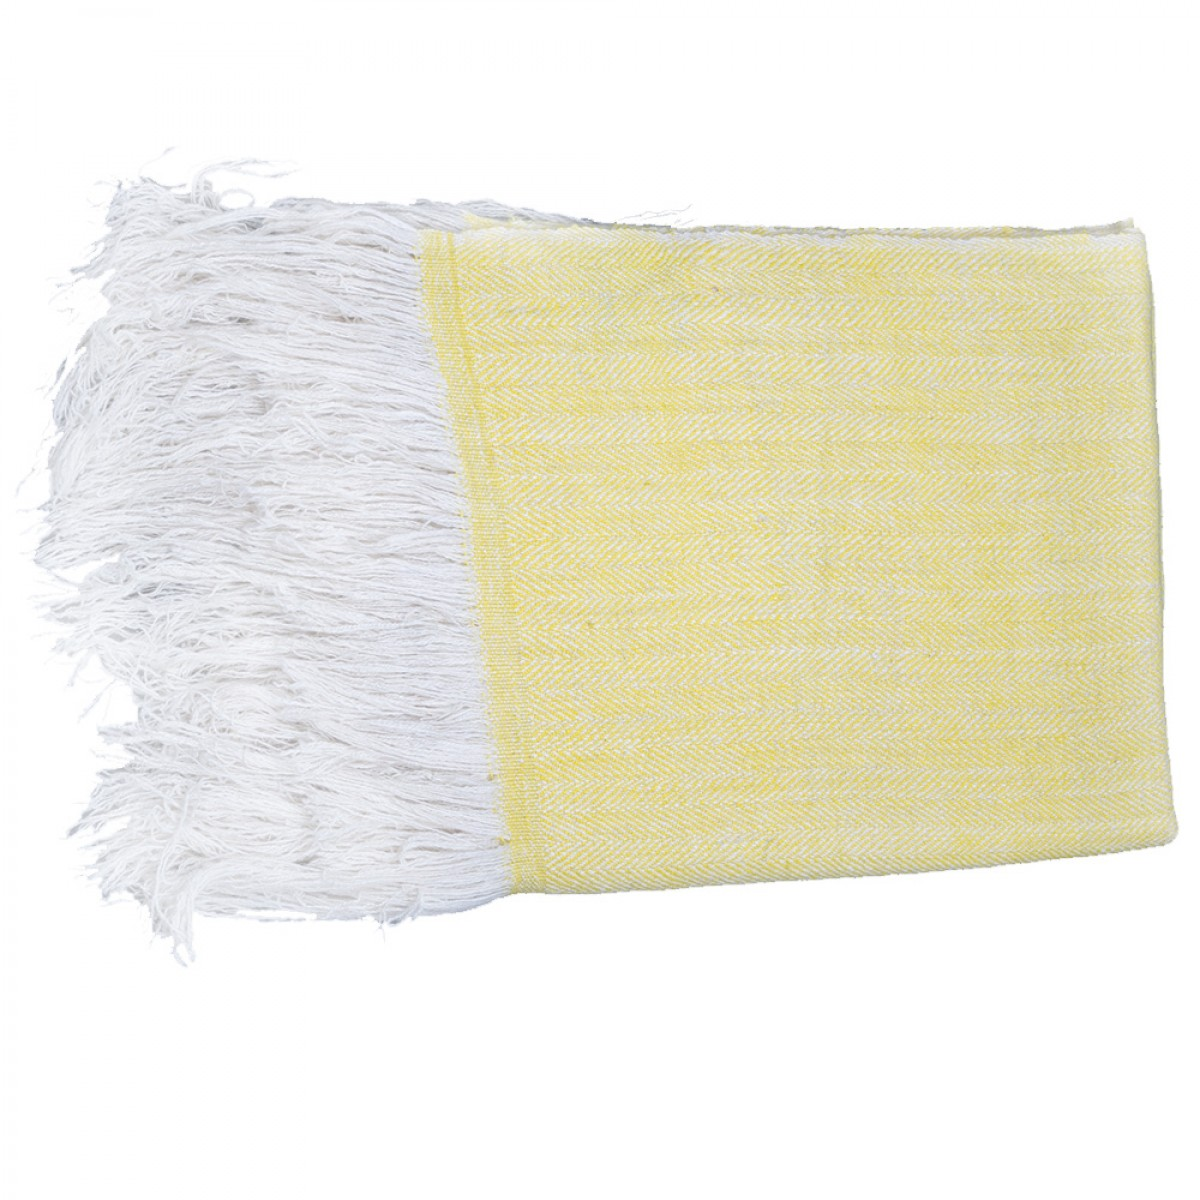 Lemon Yellow Herringbone Weave Cashmere Blanket